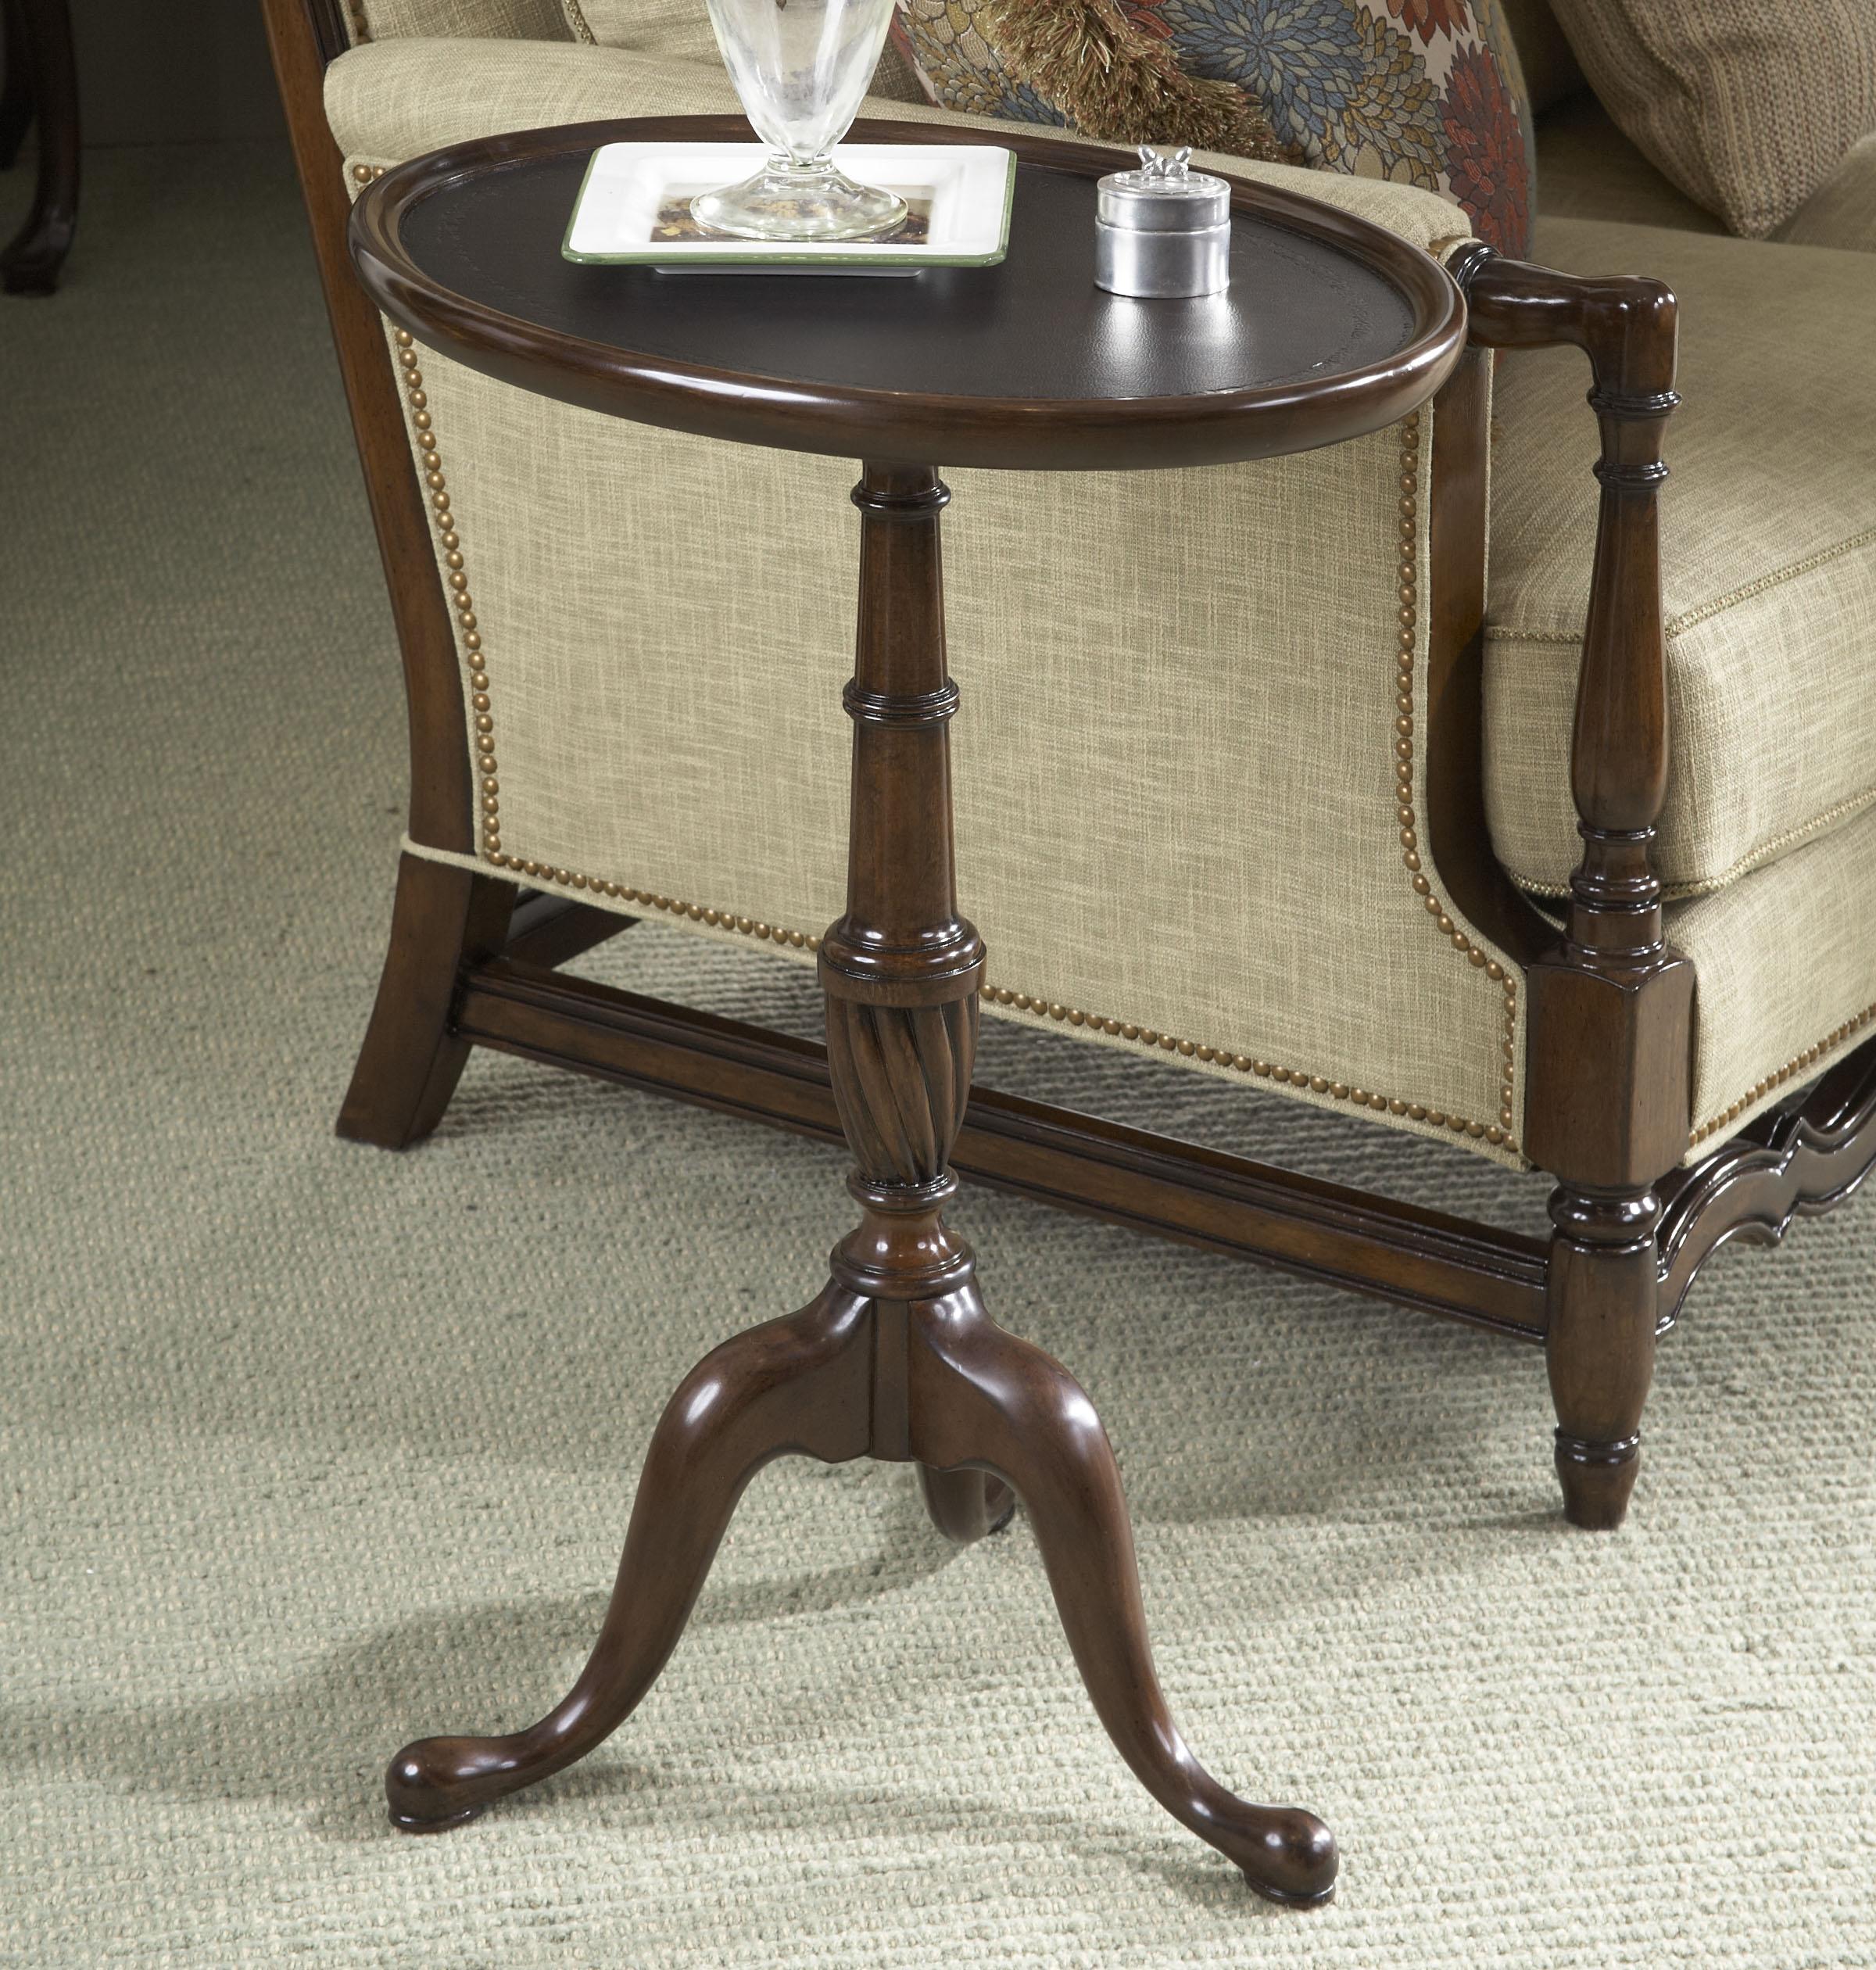 Fine Furniture Design American Cherry Arlington Pedestal Table Jacksonville Furniture Mart